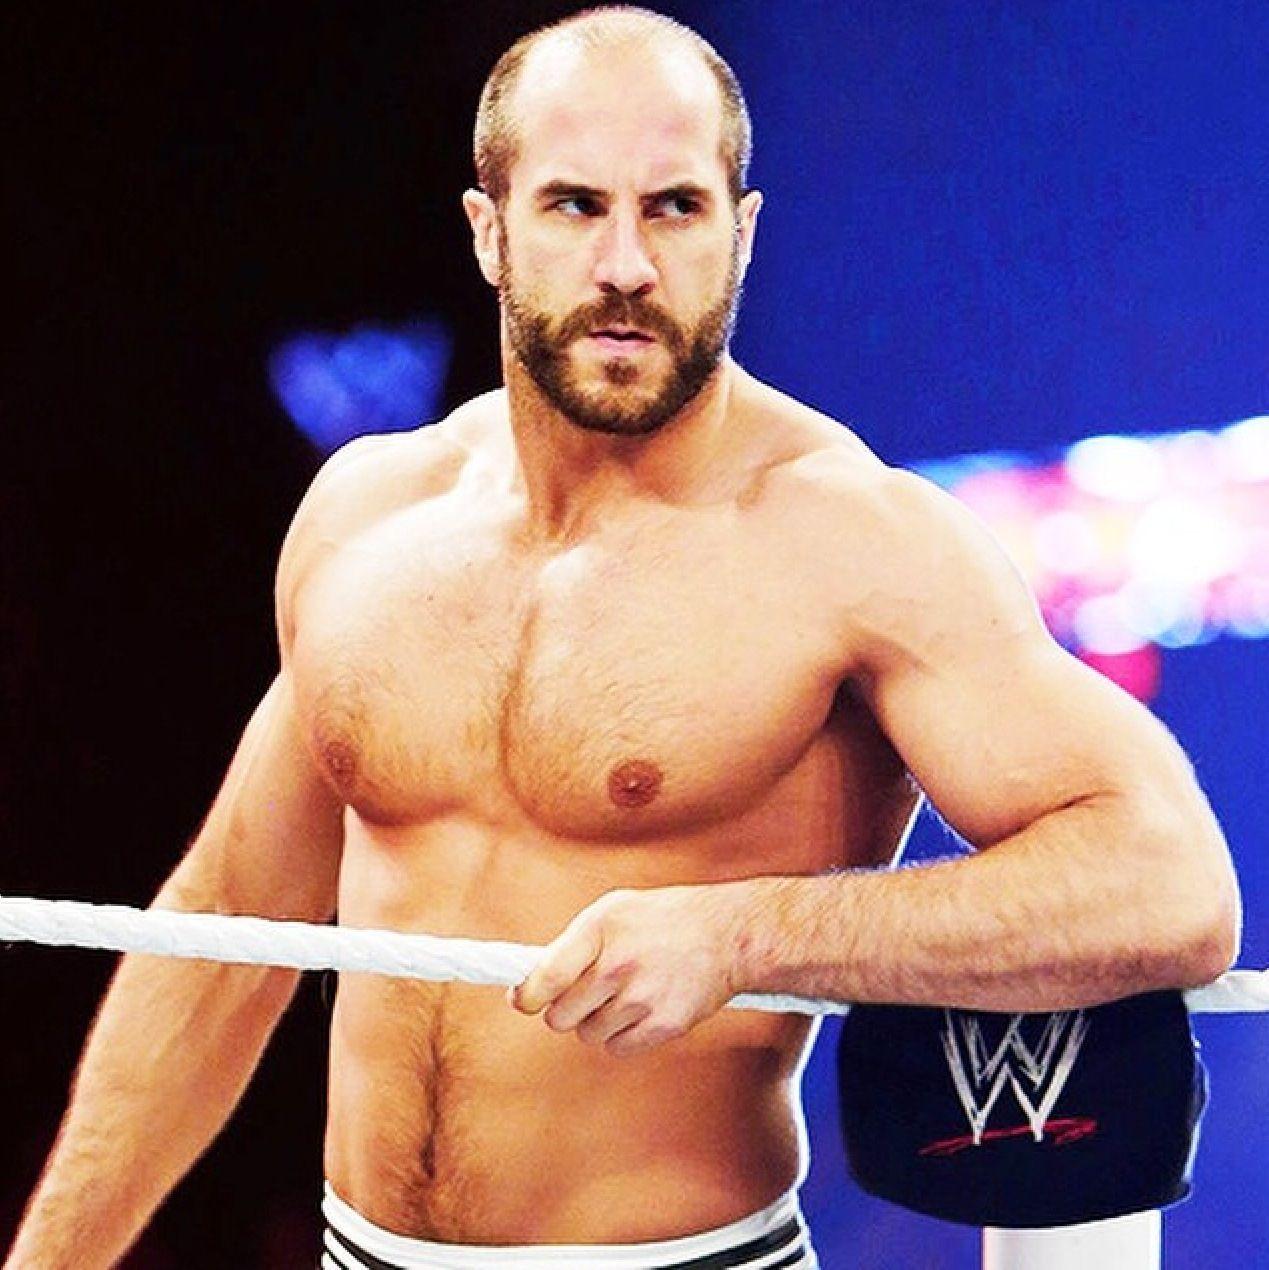 Wwe Sports, Antonio Cesaro, Wwe Wrestlers